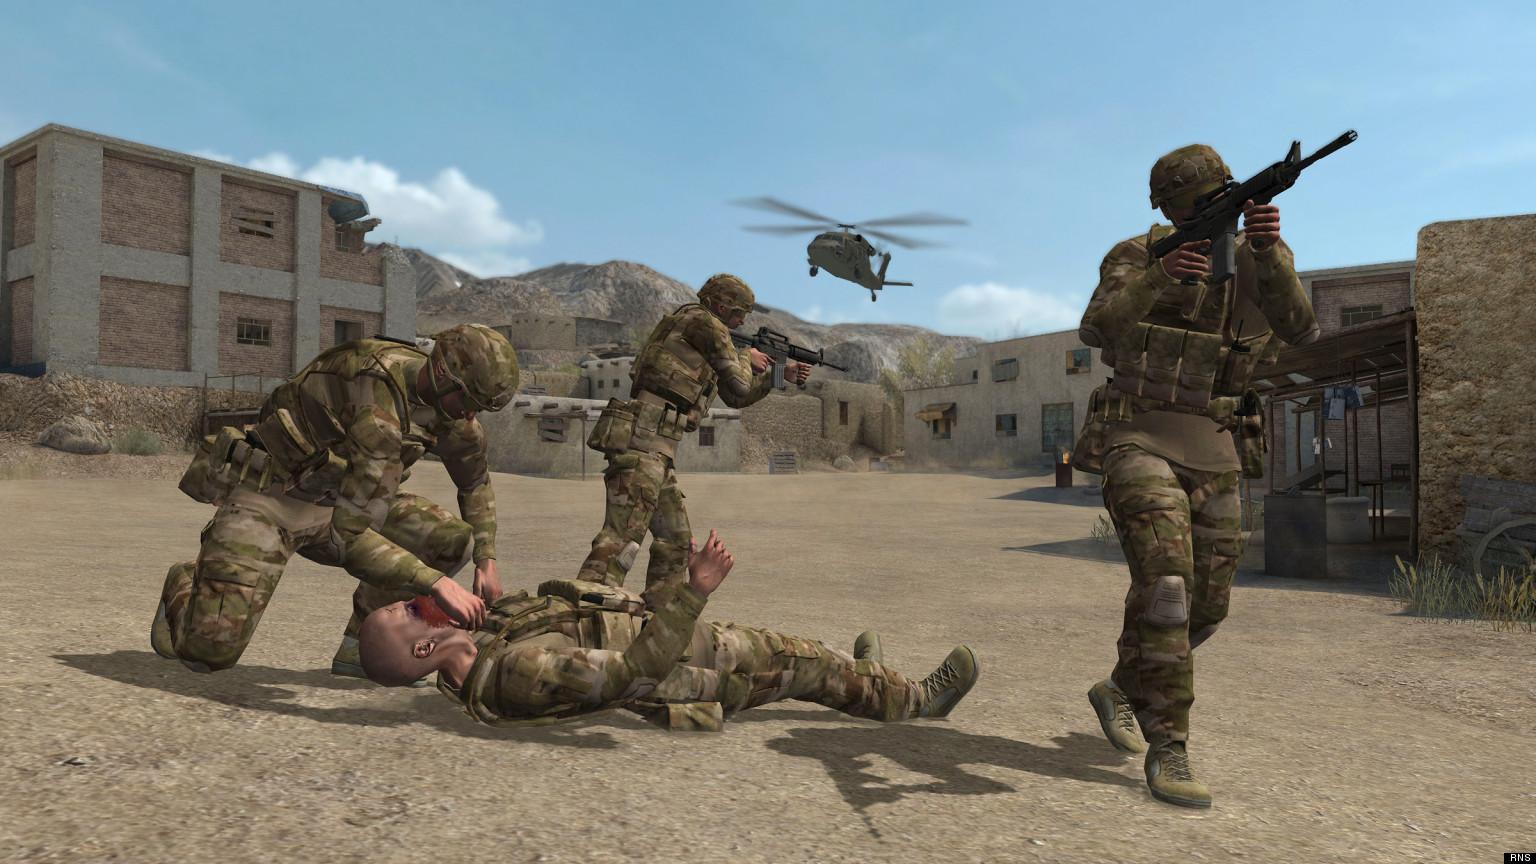 Army Simulators Games 171 The Best 10 Battleship Games